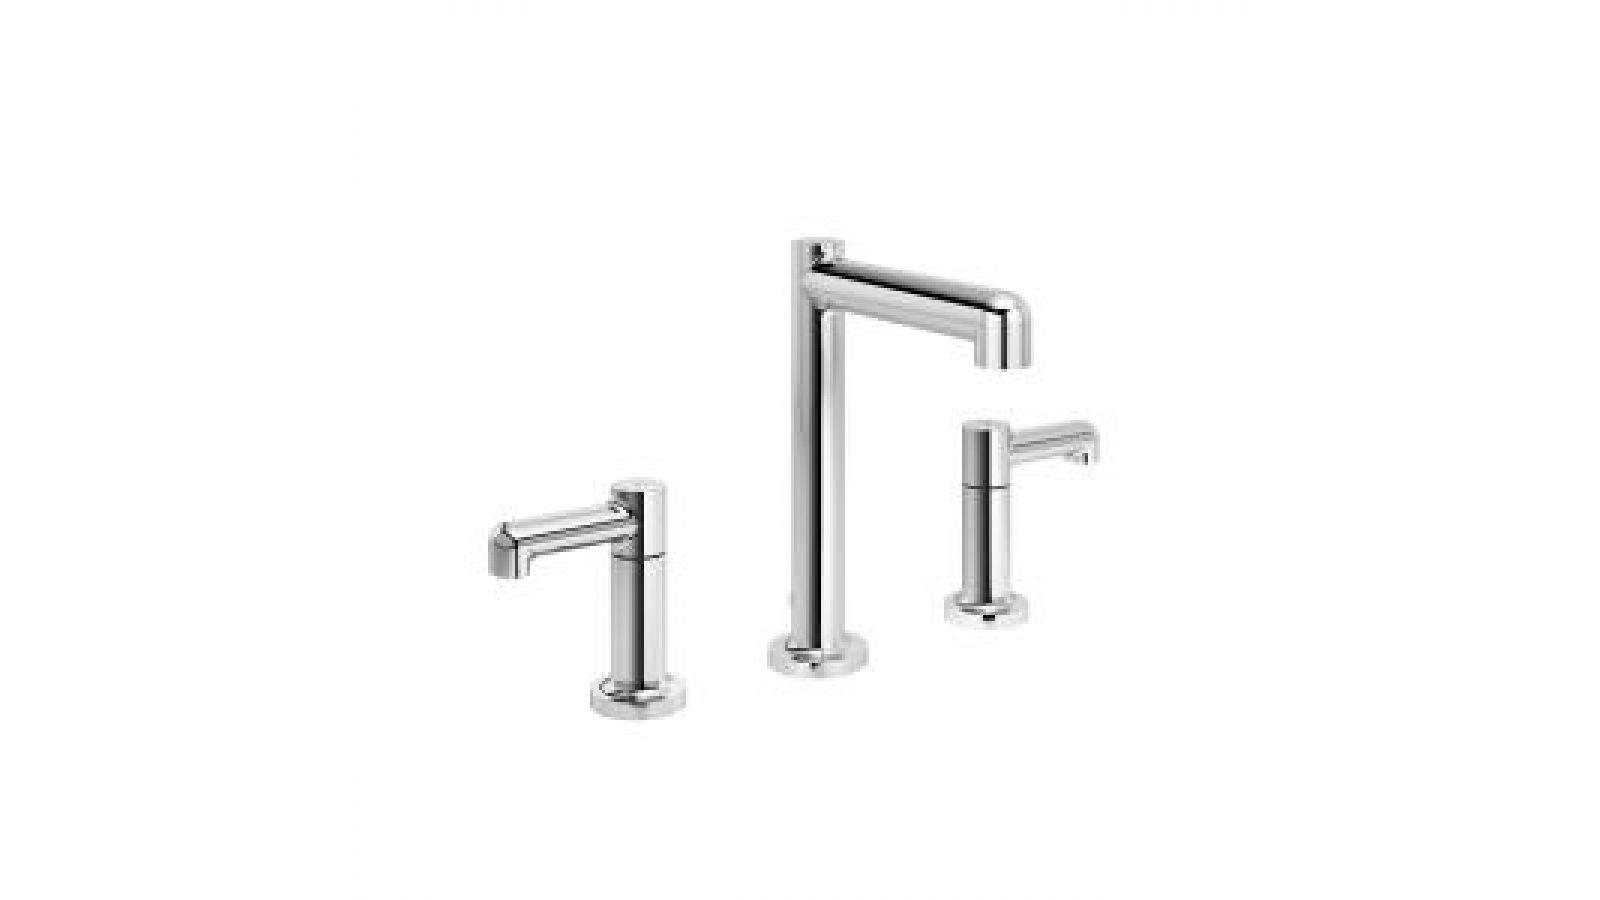 Museo bath faucet in chrome